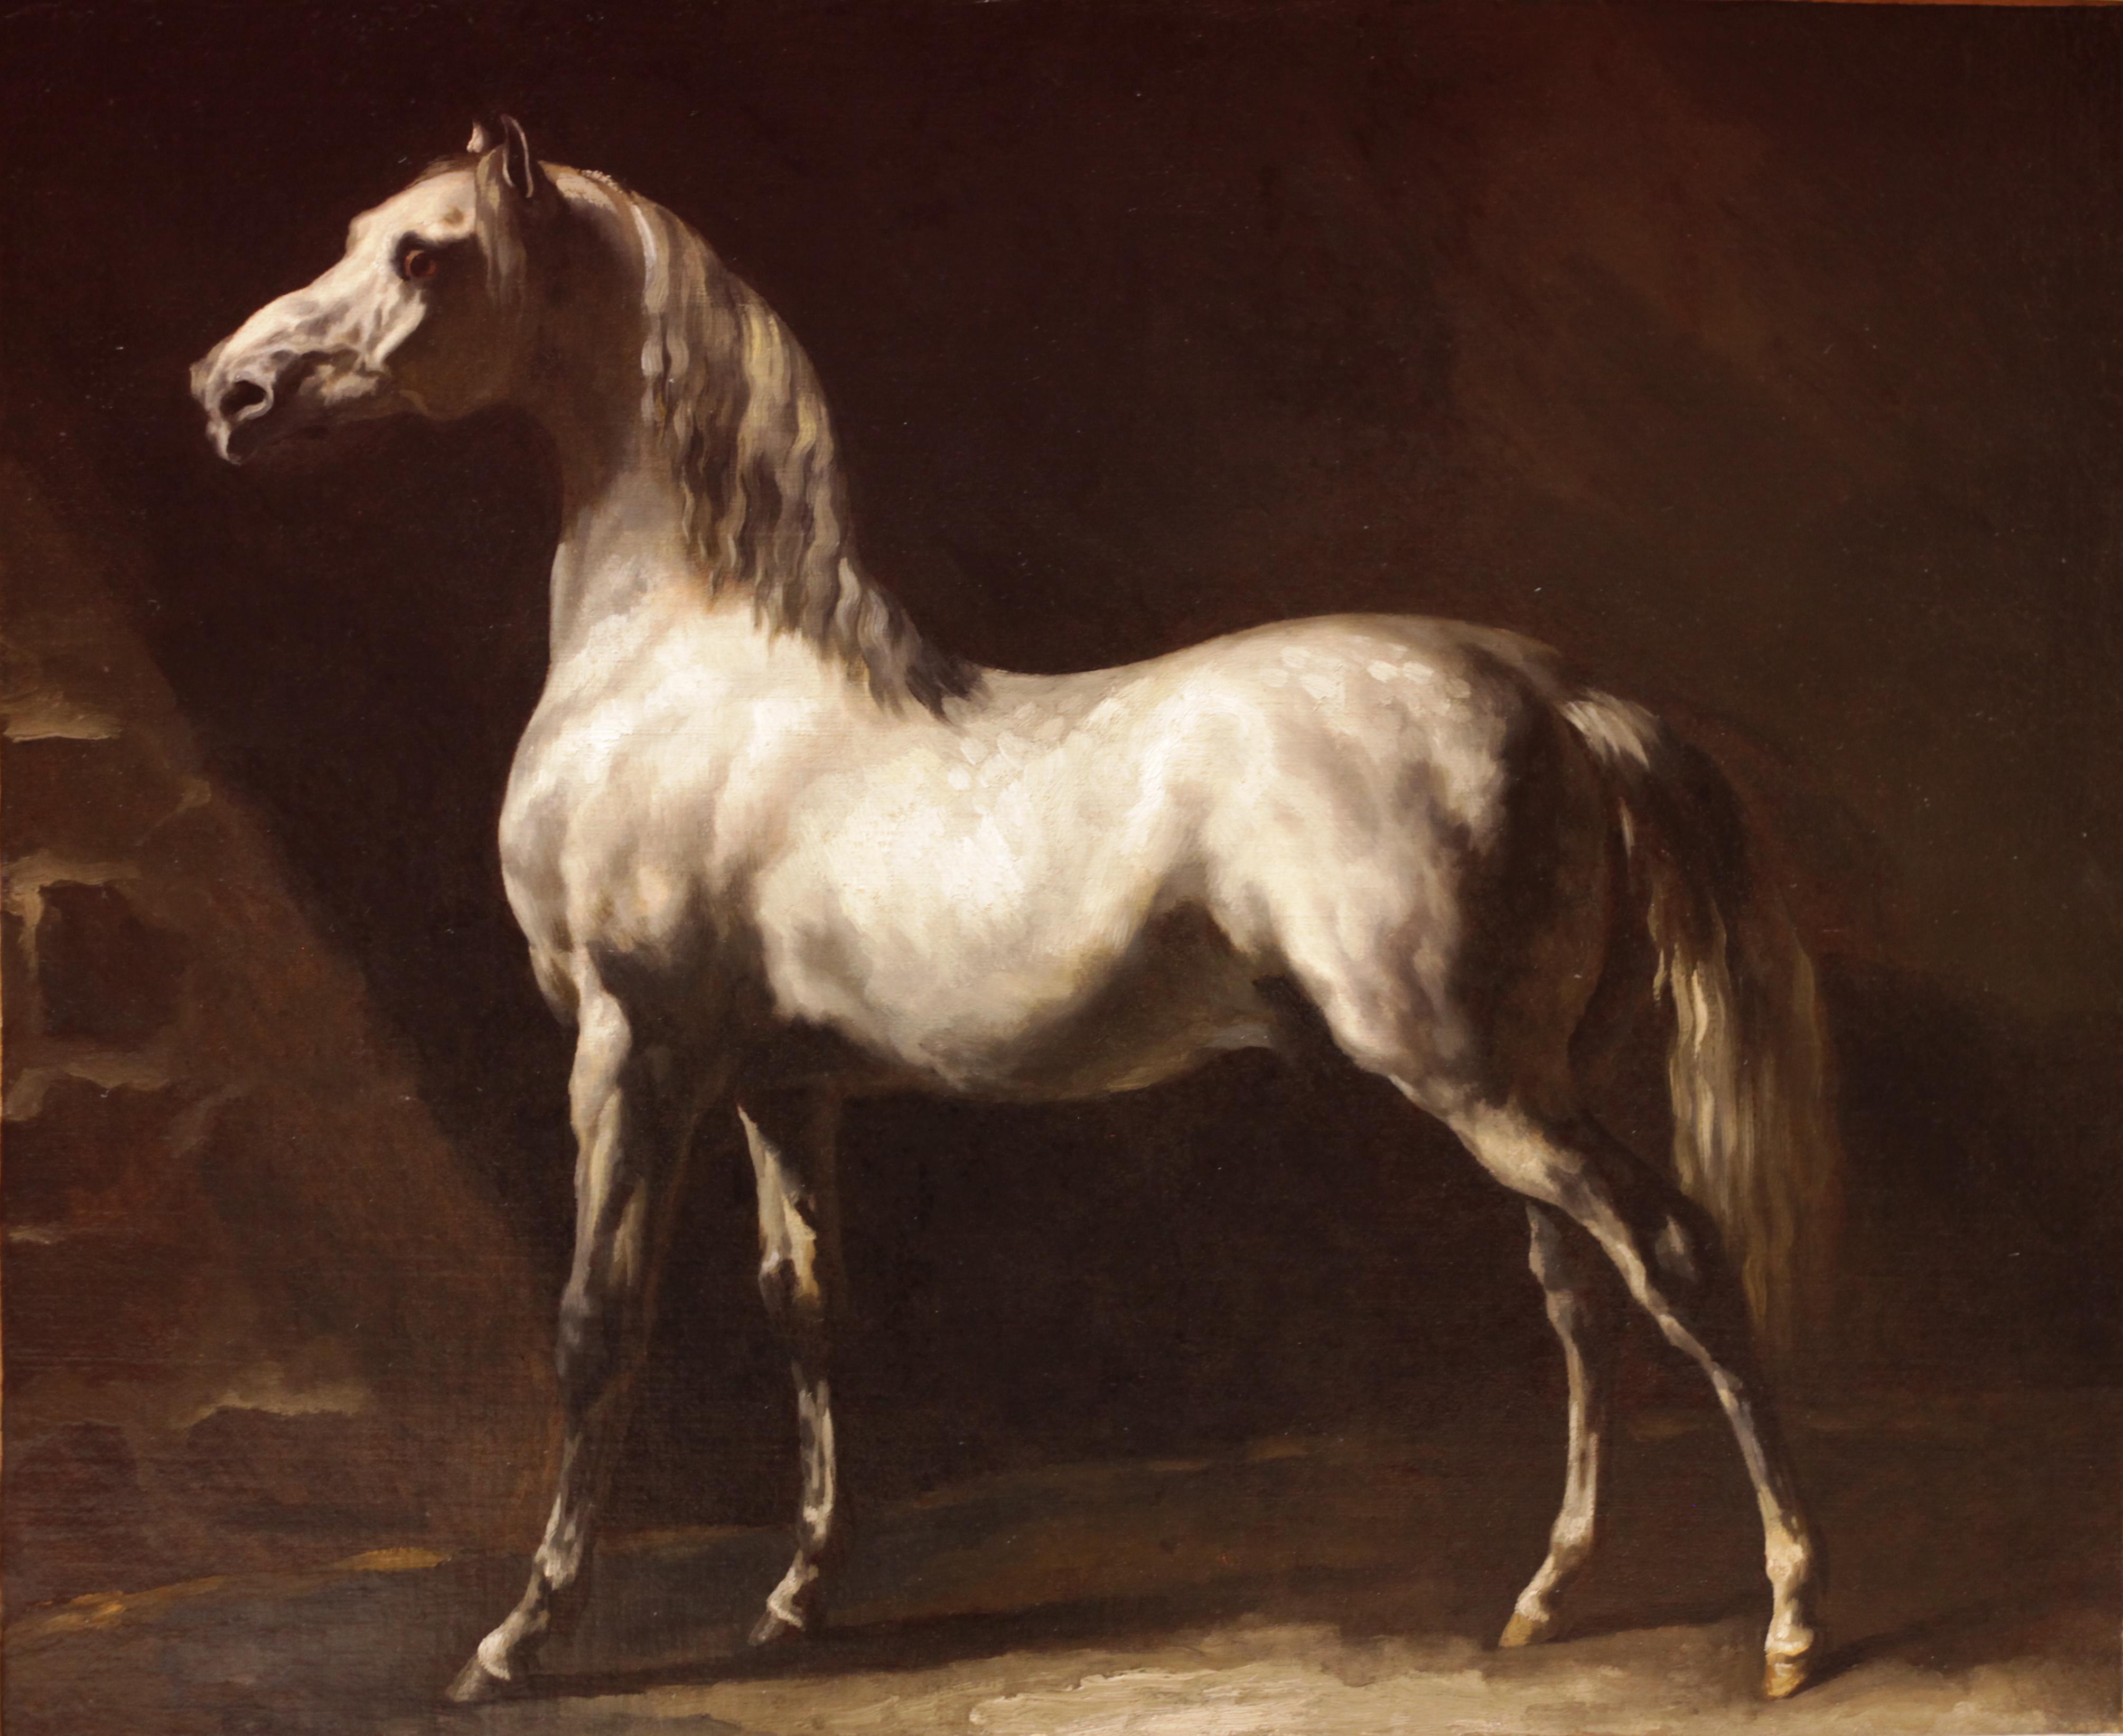 cheval arabe gris blanc theodore gericault